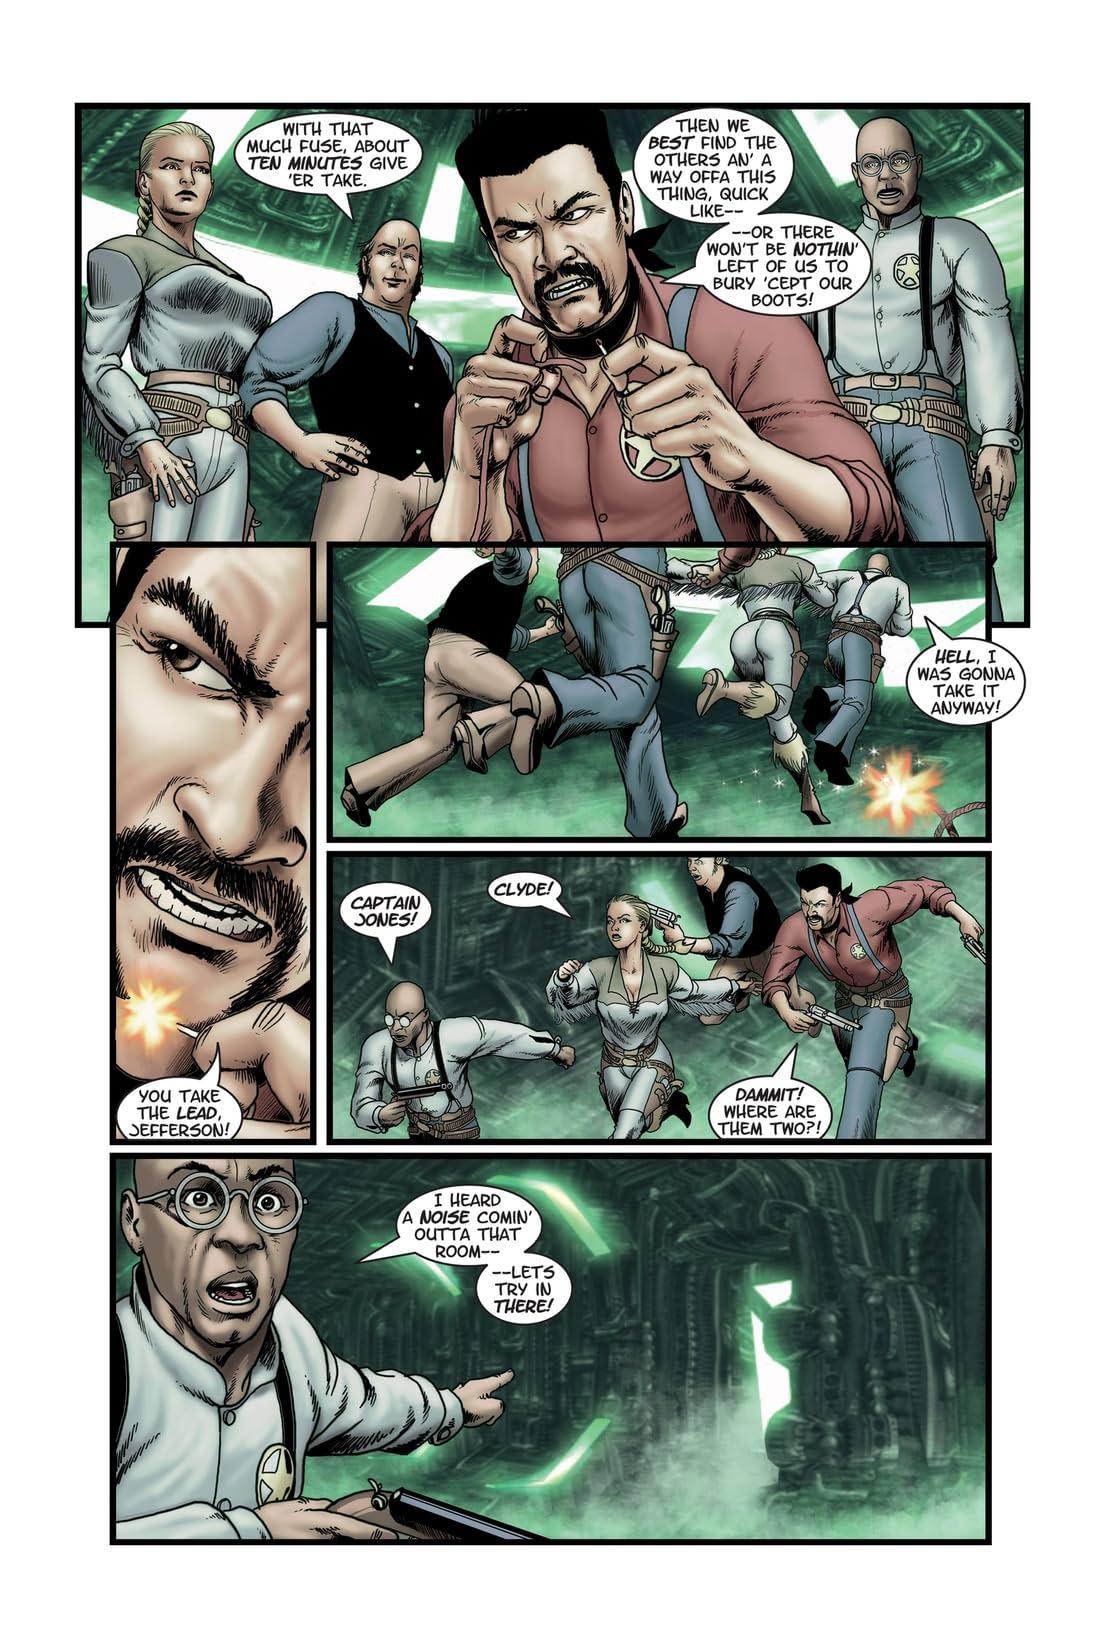 The Misadventures of Clark & Jefferson #4